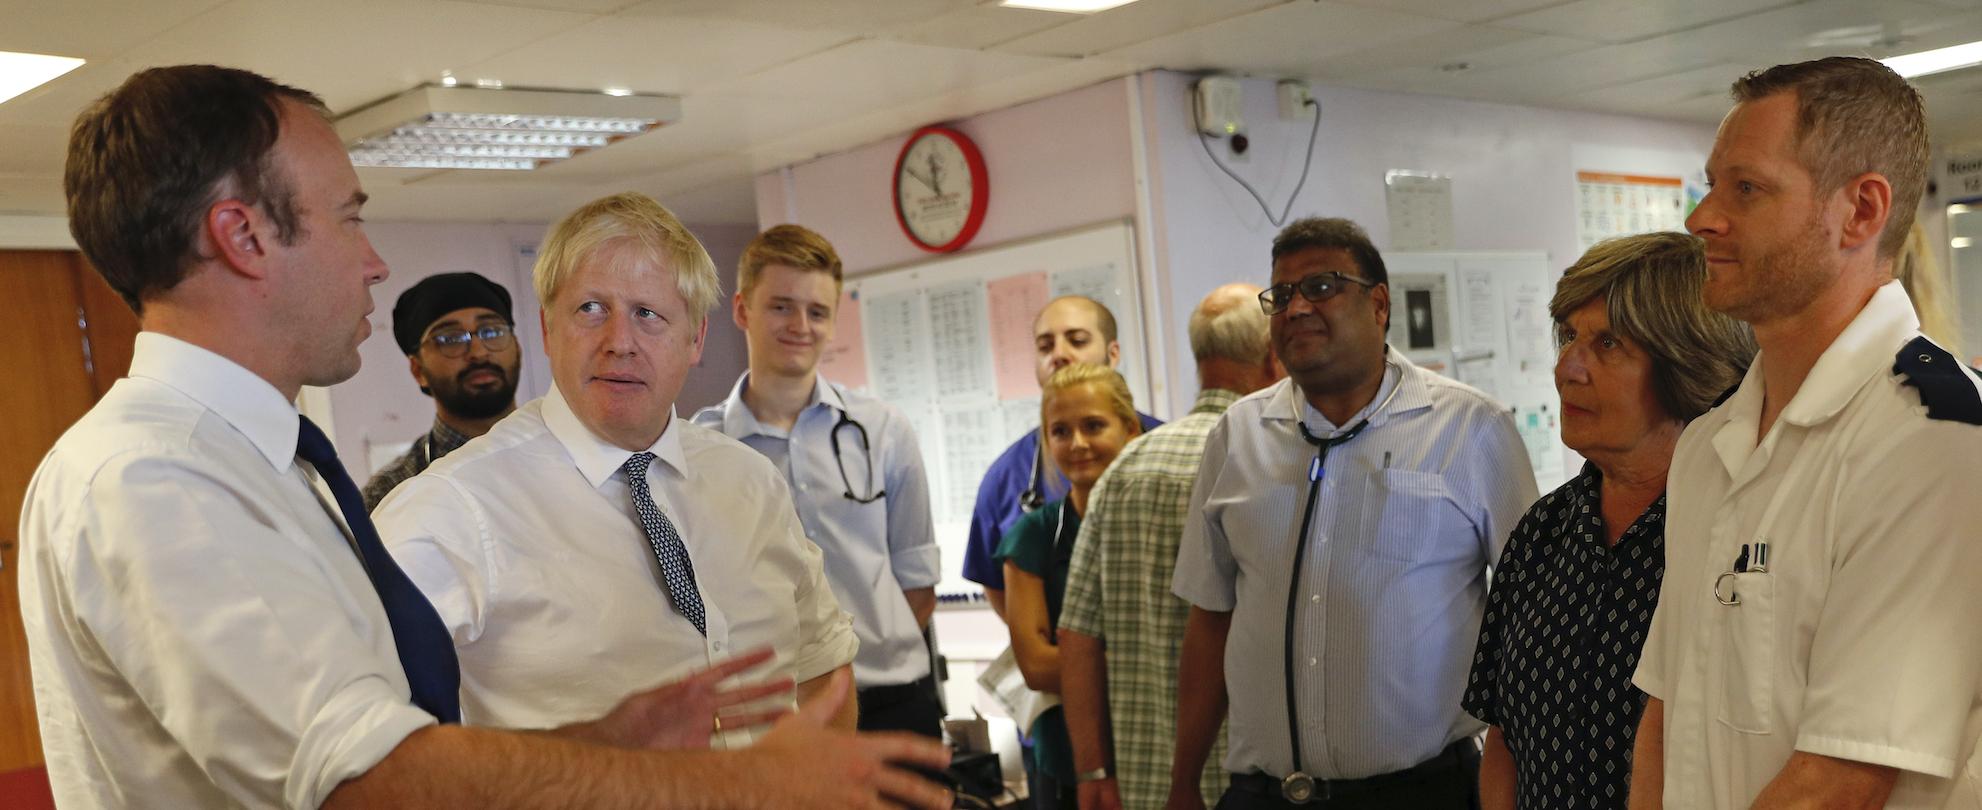 Matt Hancock and Boris Johnson visit an NHS hospital.